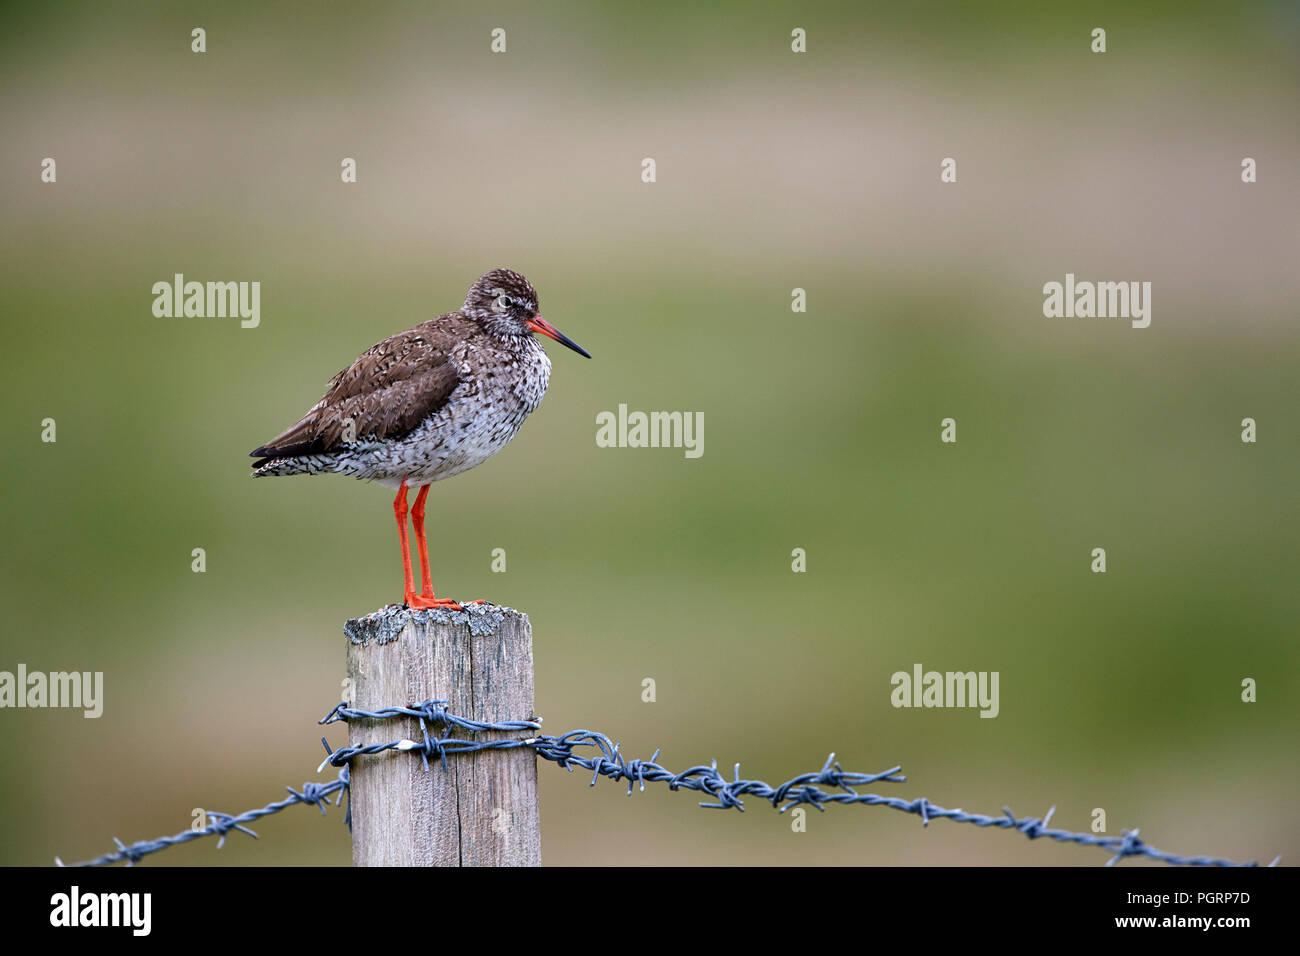 Common redshank, Tringa totanus, UK - Stock Image